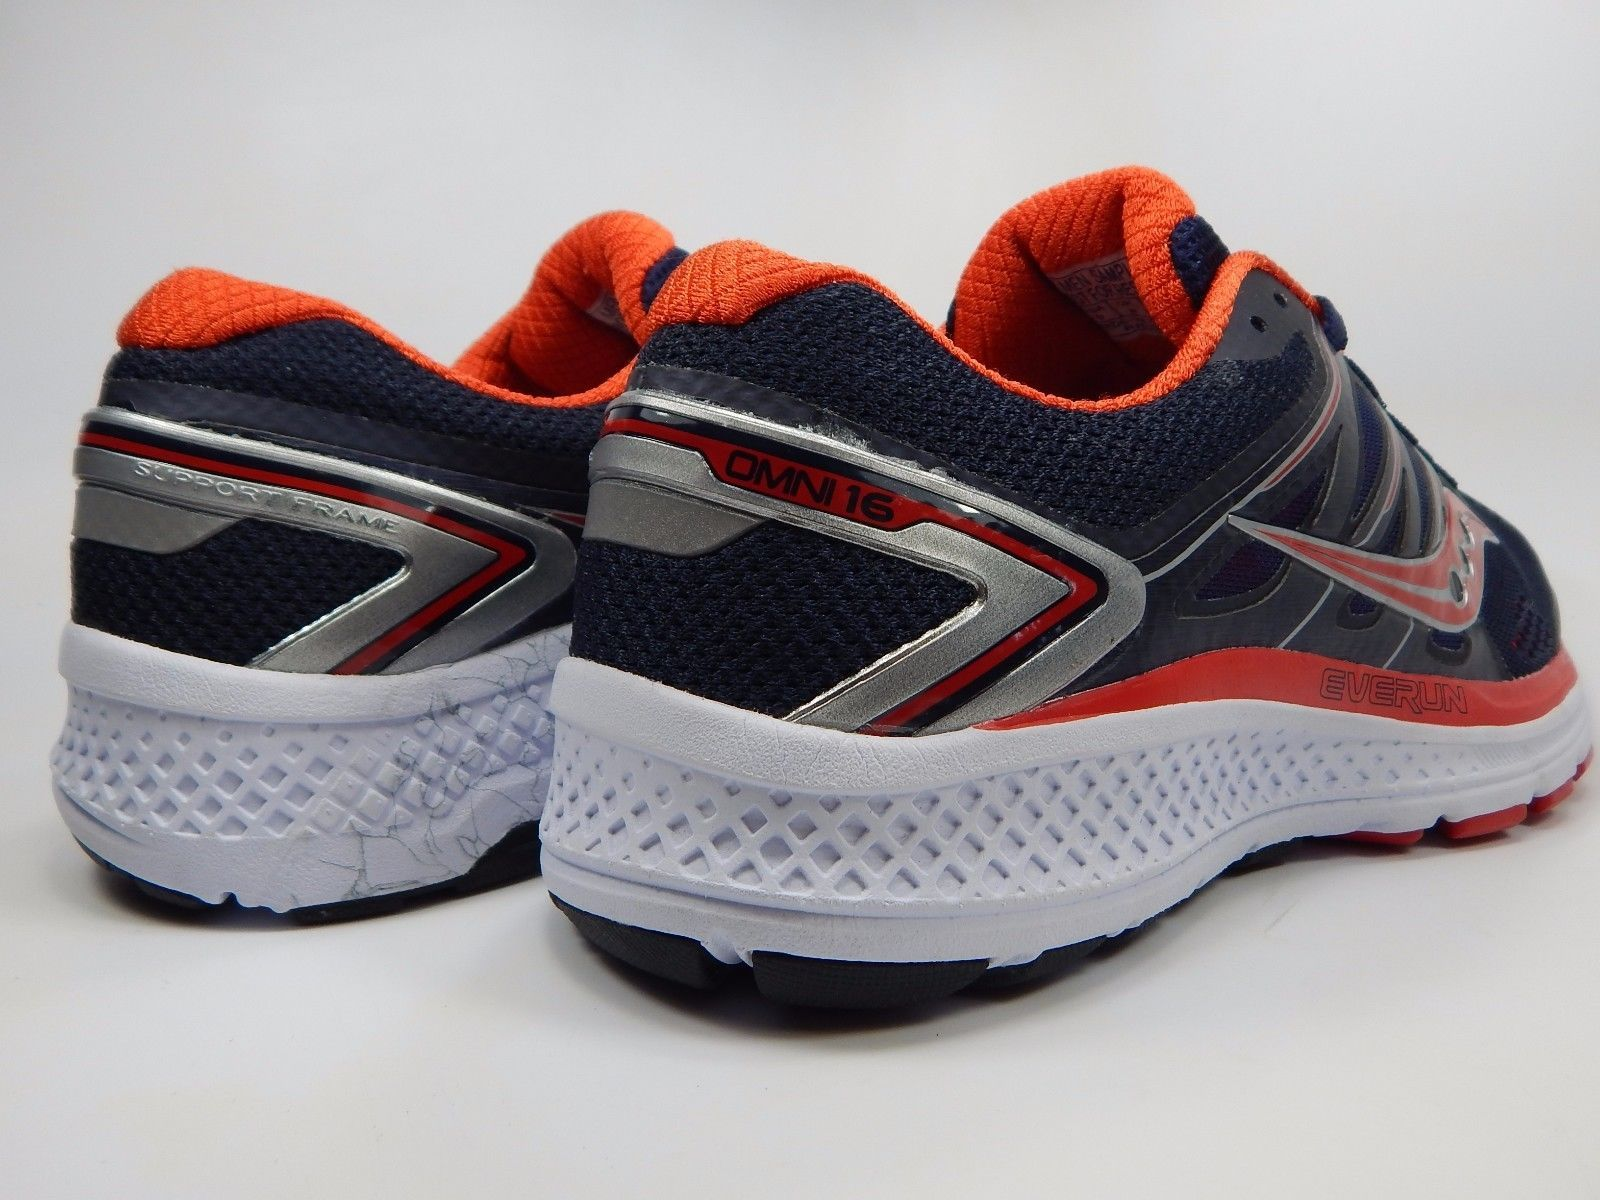 Saucony Omni 16 Men's Running Shoes Size US 9 M (D) EU 42.5 Navy Red S20370-2